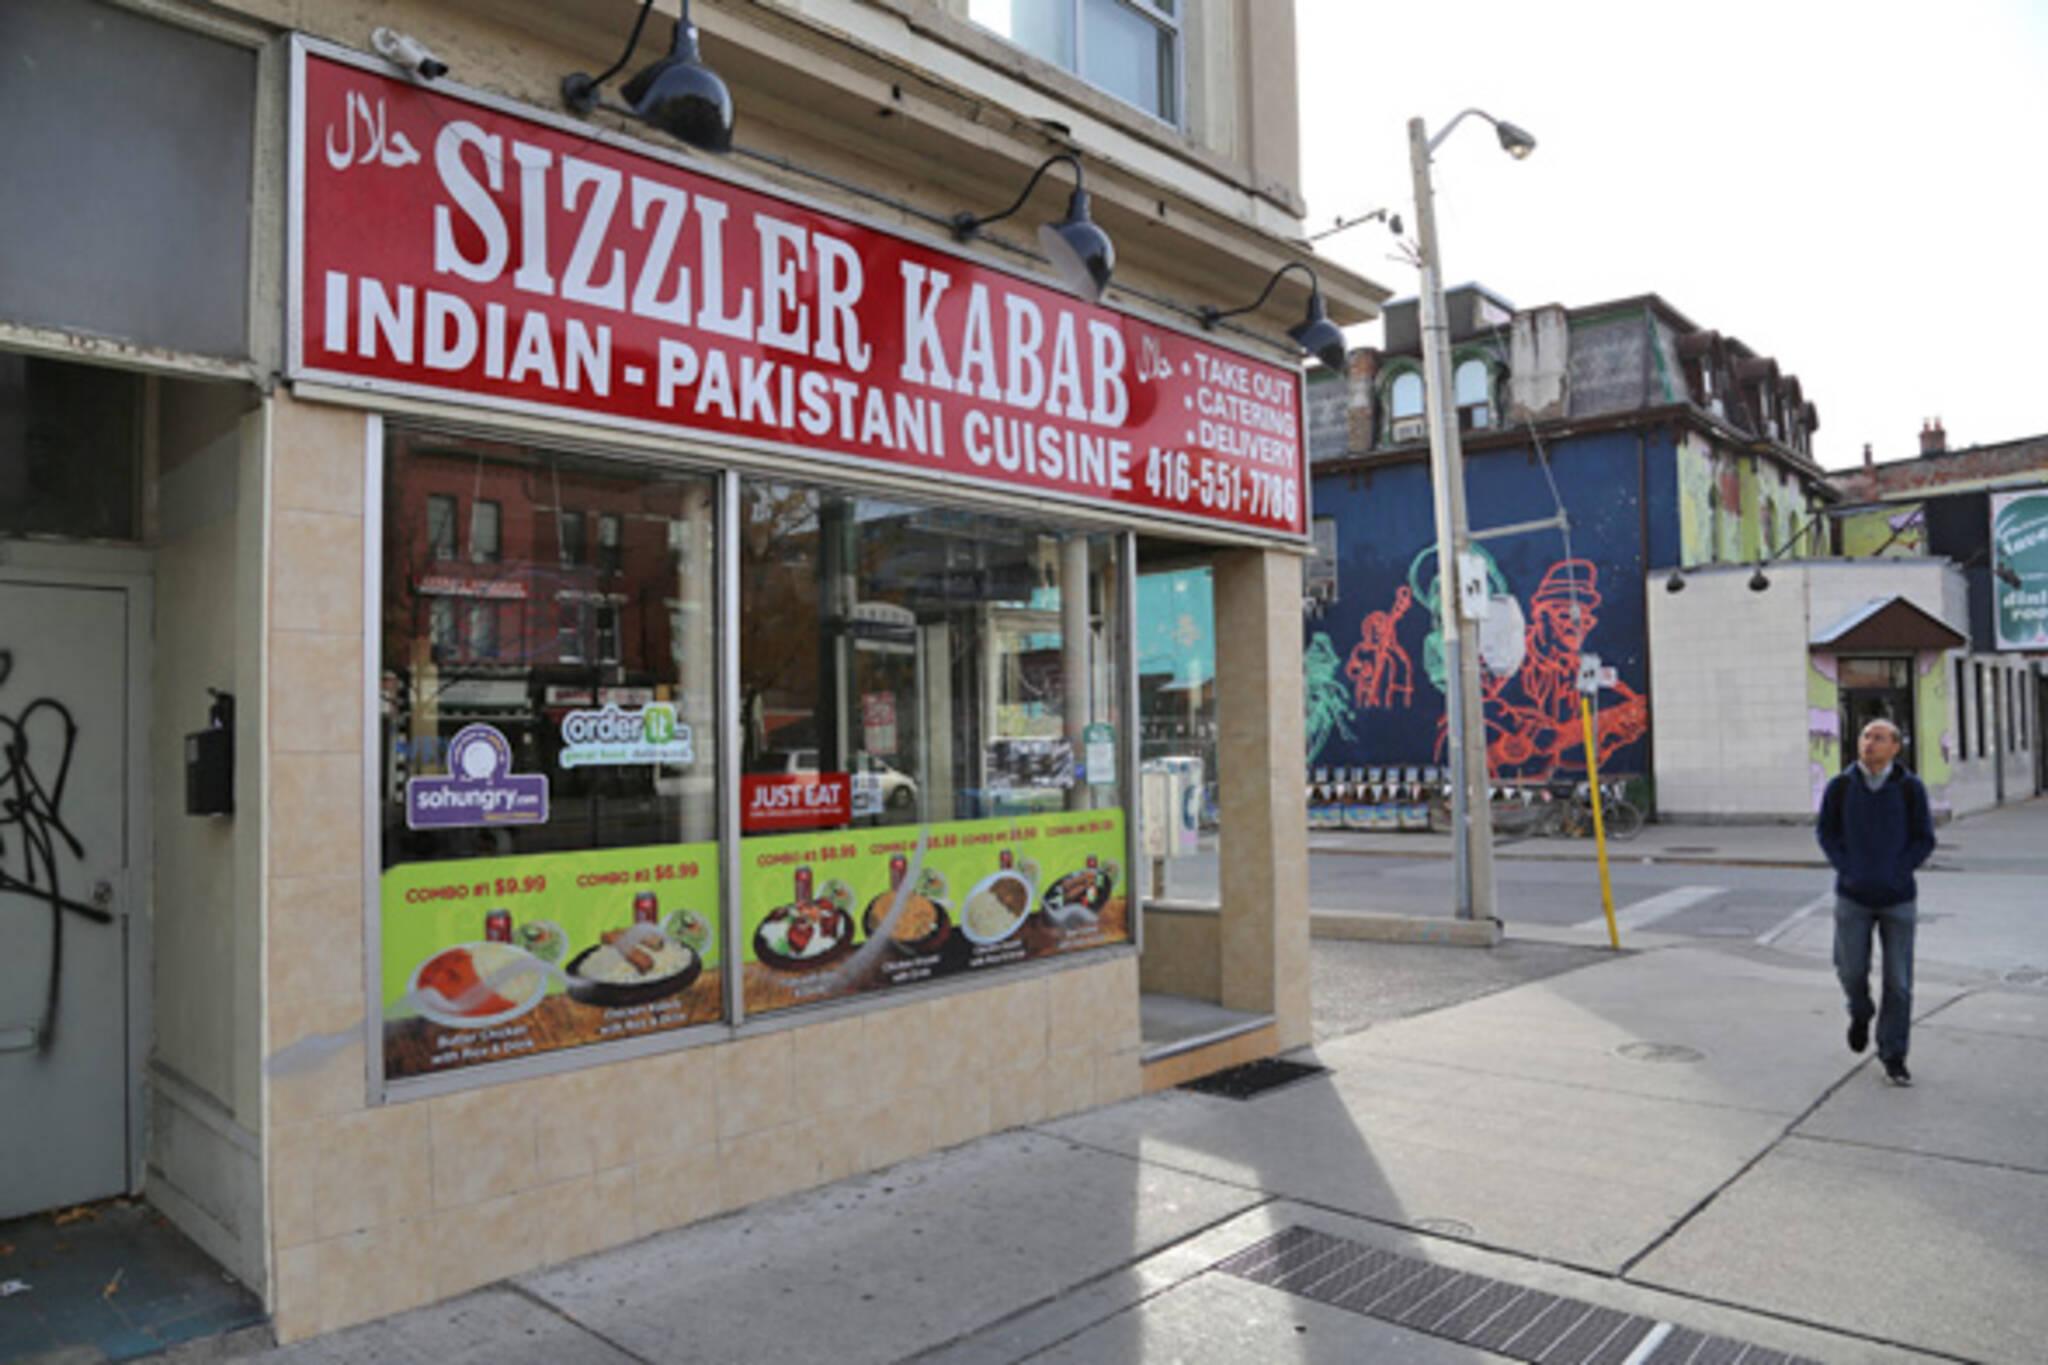 Sizzler Kebab